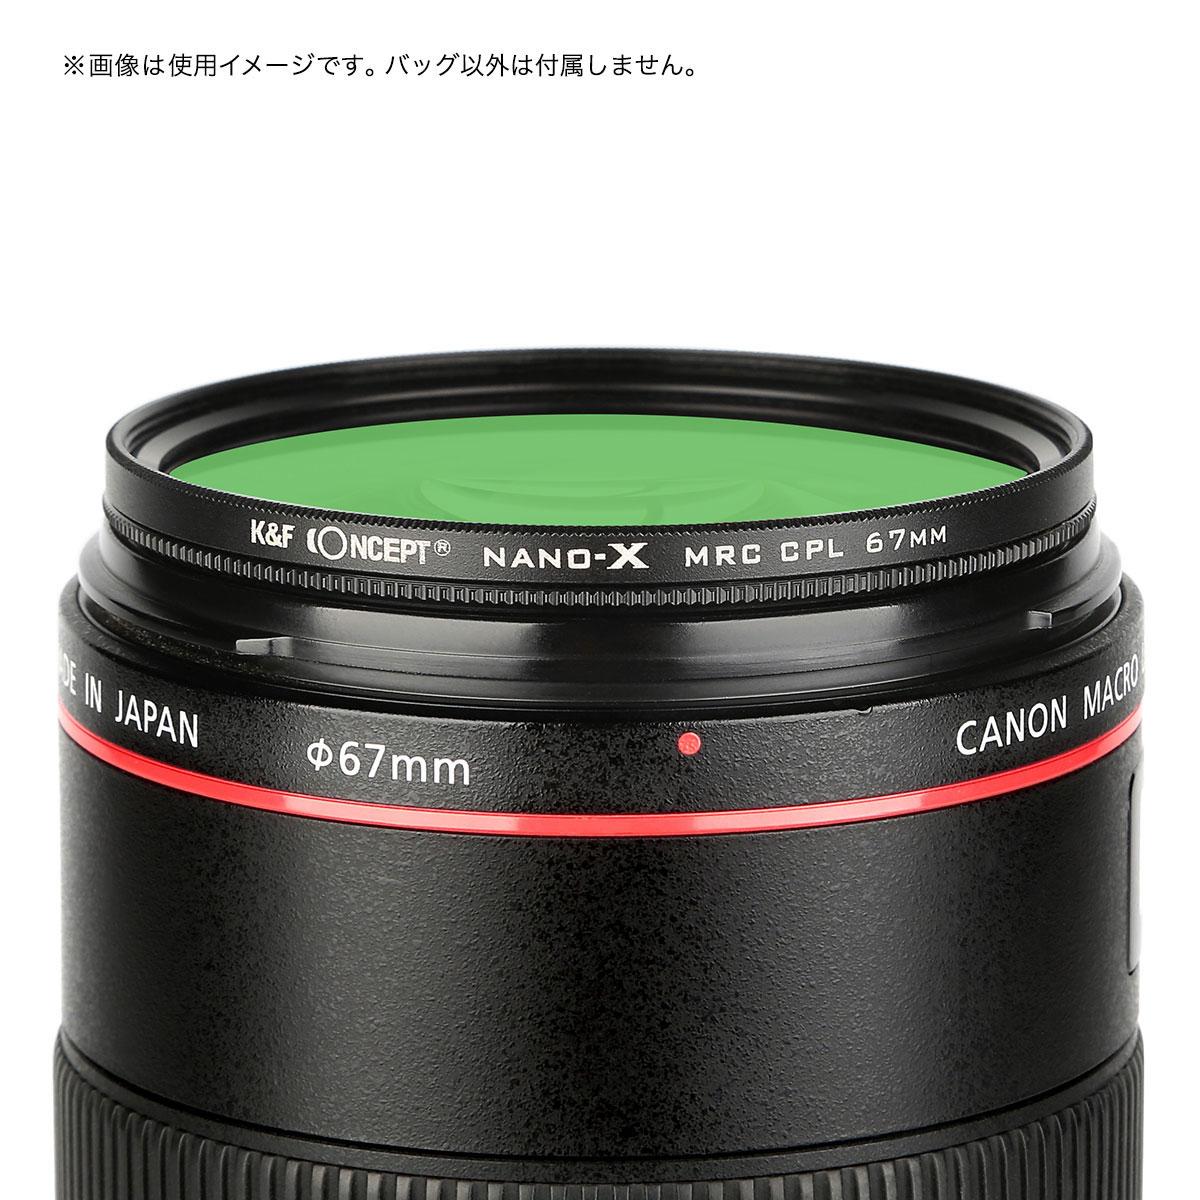 K&F 82mm MRCナノコーティング ドイツB270高透明度クラウンガラス KF-SCPL82 Concept NANO-X C-PLフィルター